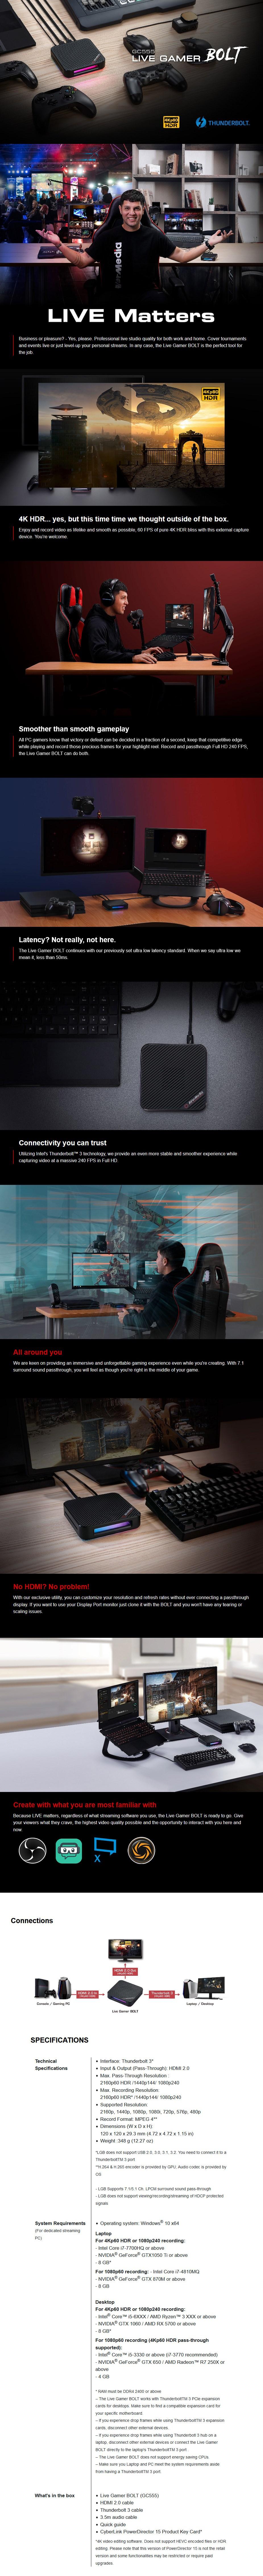 avermedia-gc555-live-gamer-bolt-capture-device-ac35174-3.jpg